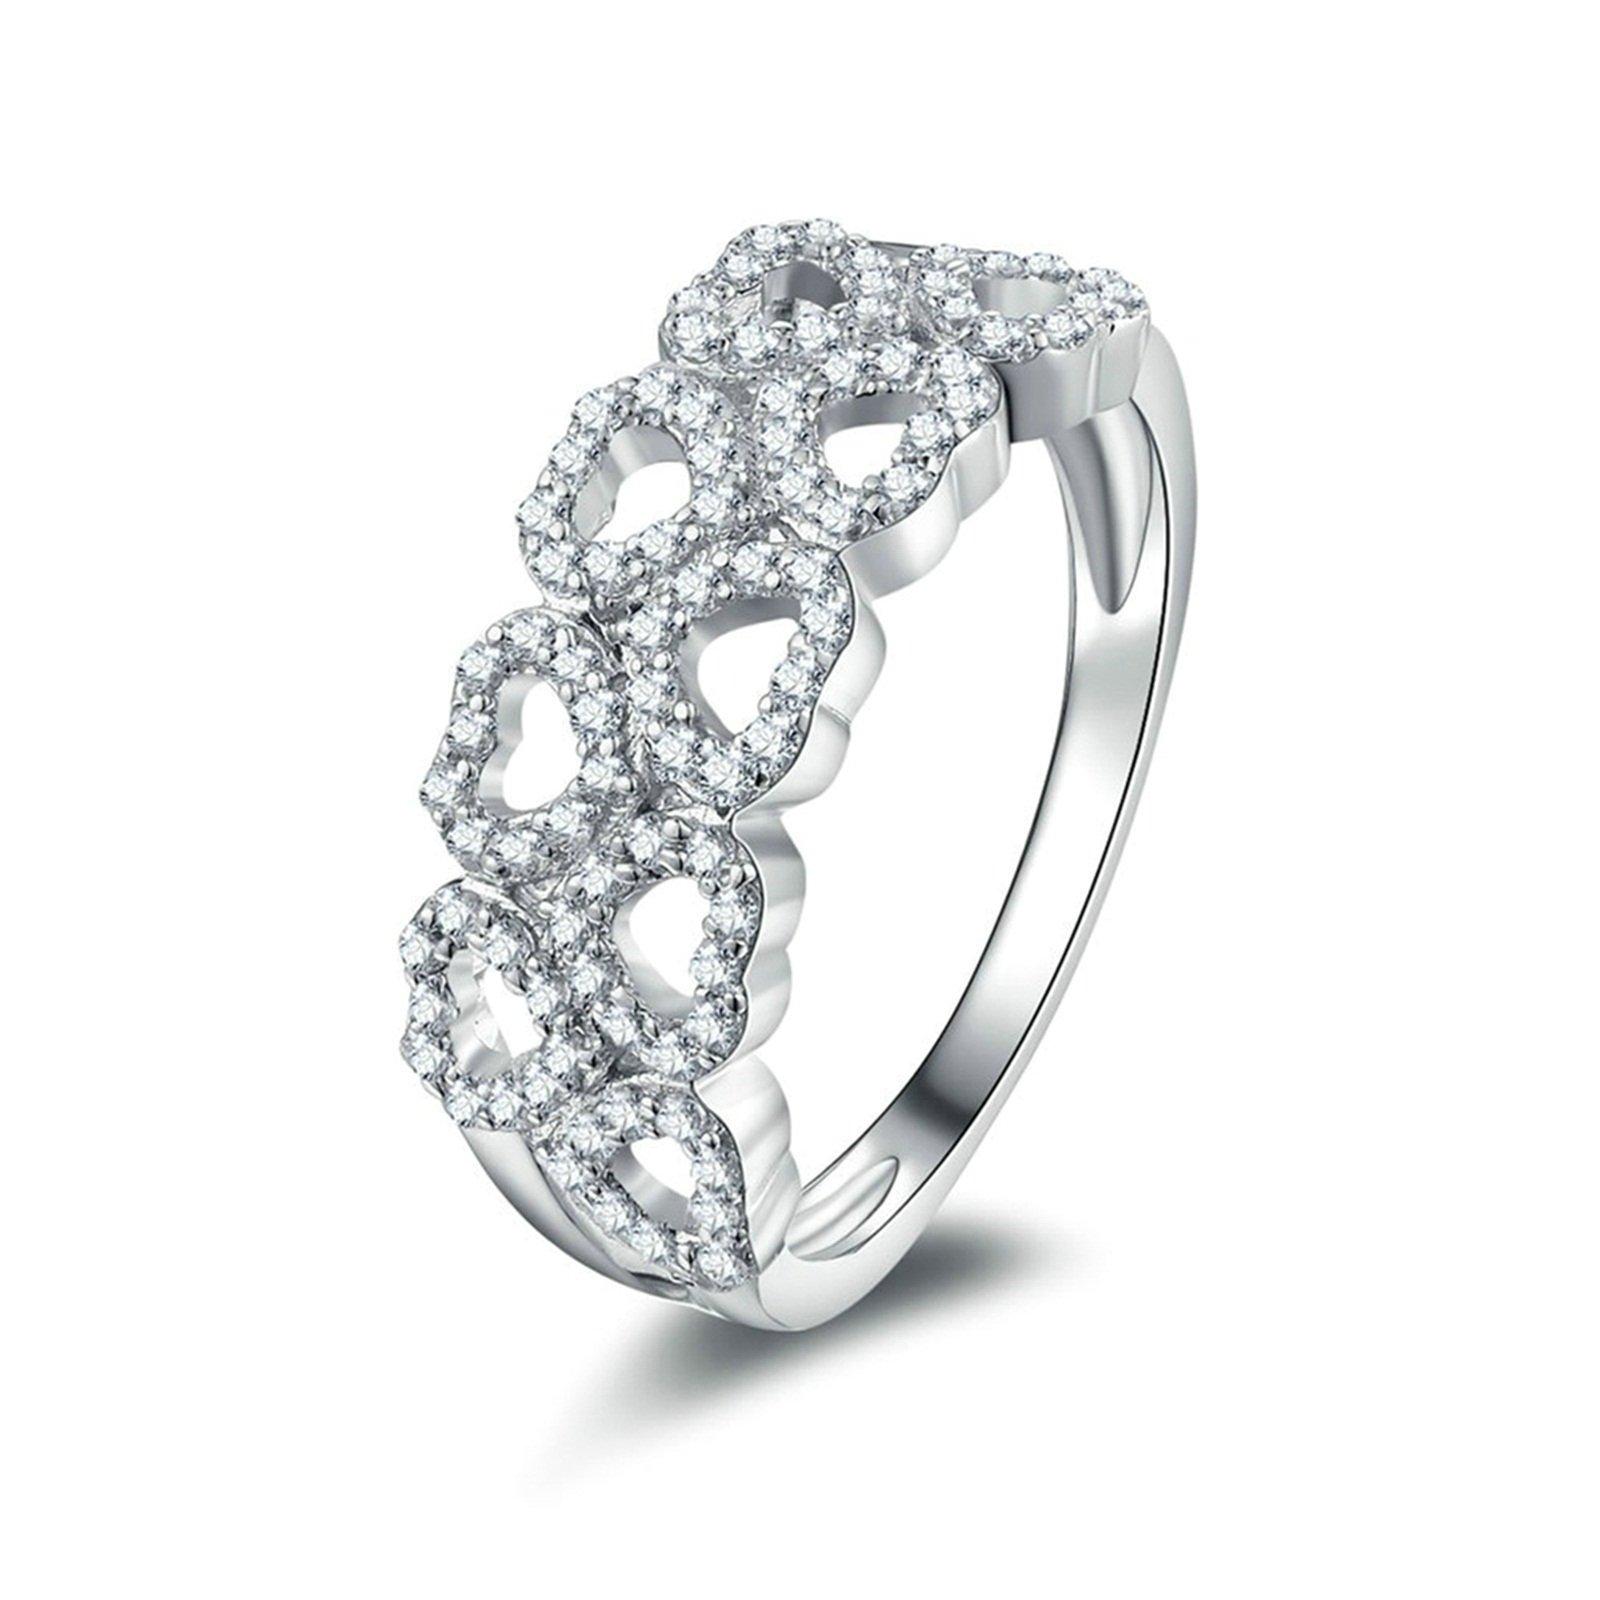 Beydodo Wedding Band Diamond Hollow Heart Ring Round White Cubic Zirconia Size 8 Anniversary Gift